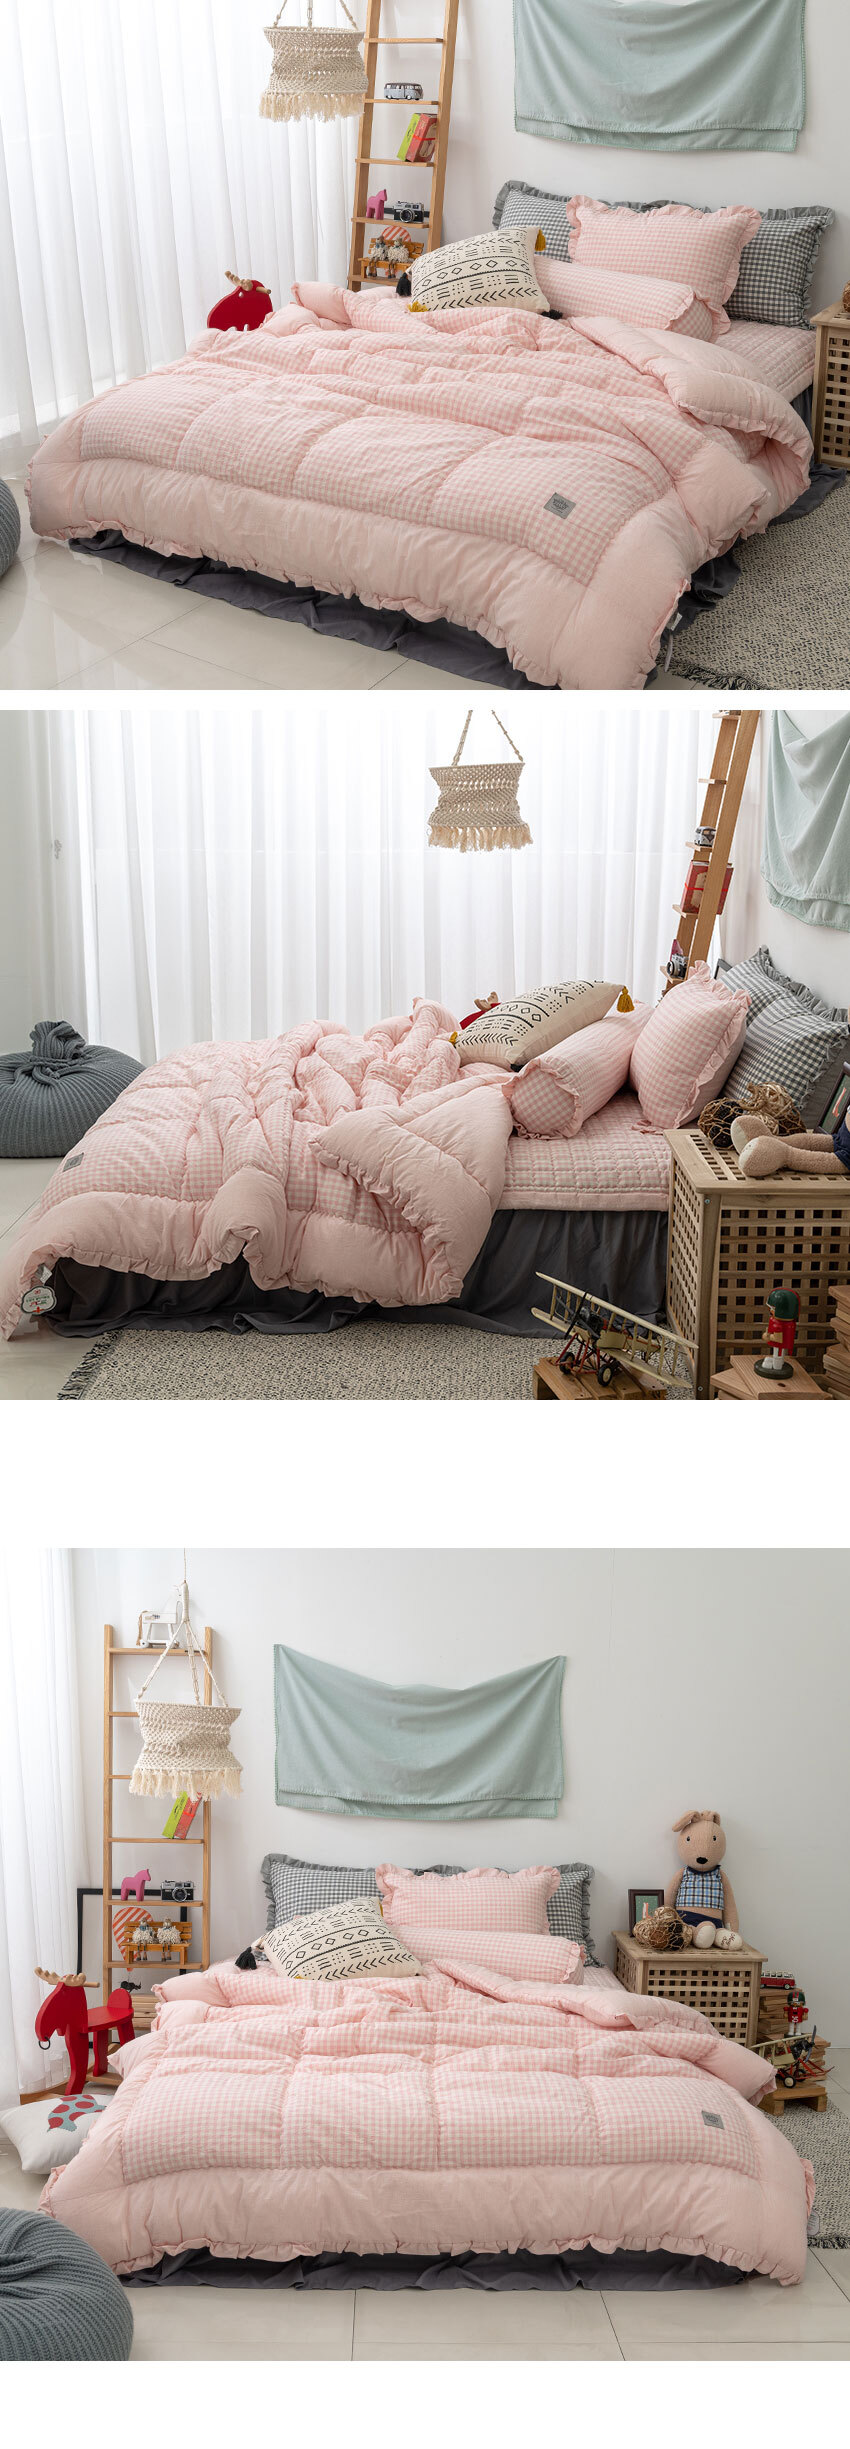 frillcheck_bed_pink02.jpg